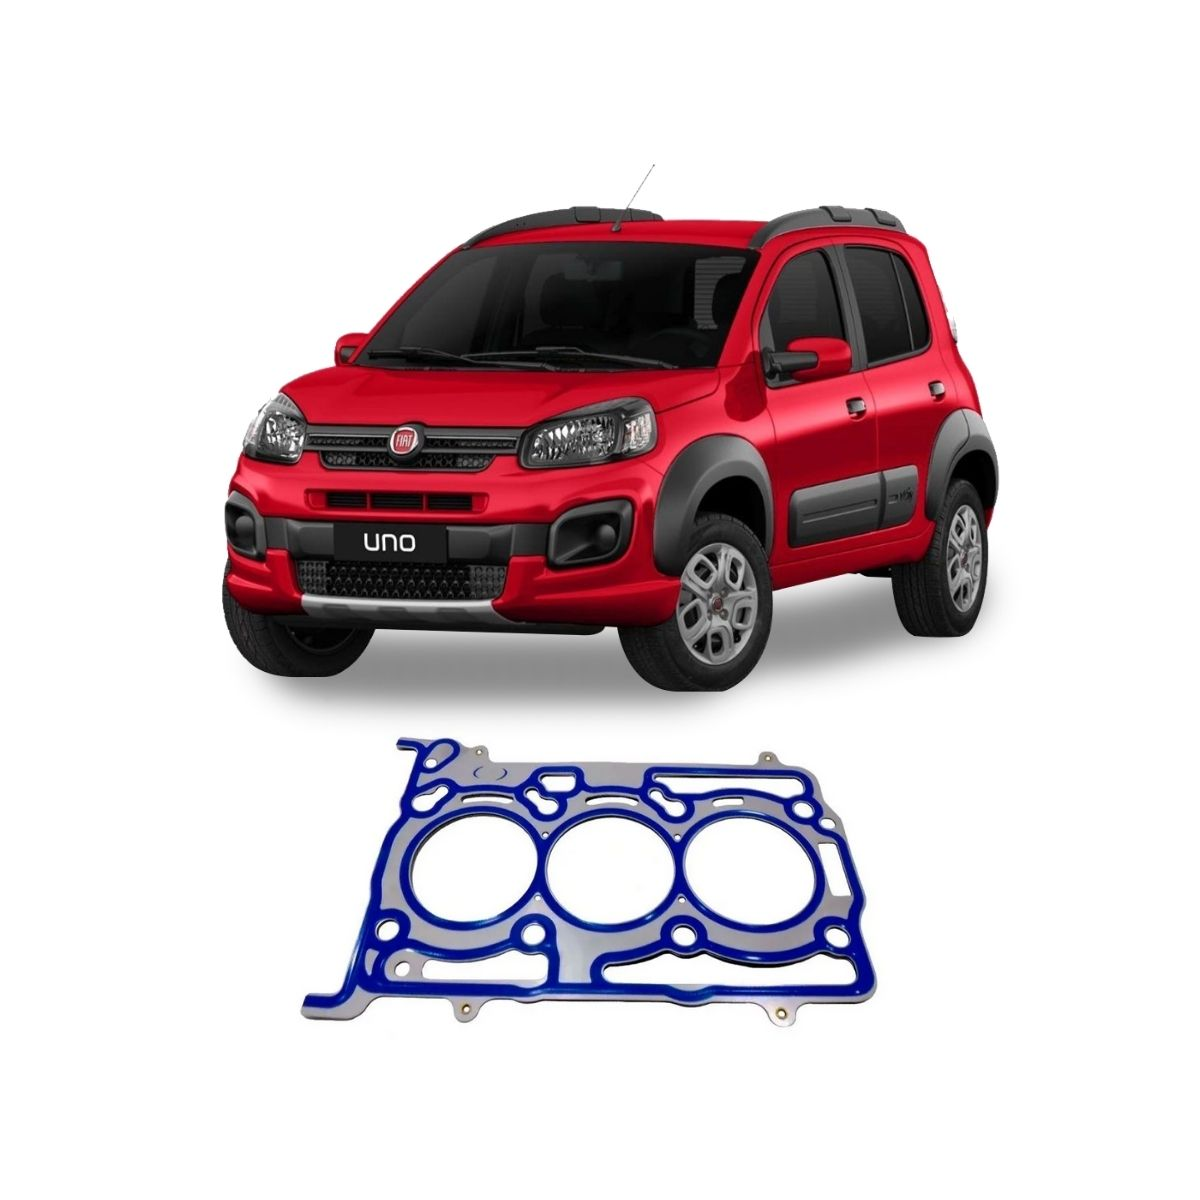 Junta Cabeçote Aço Inox Fiat Uno 1.3 2017 Em Diante